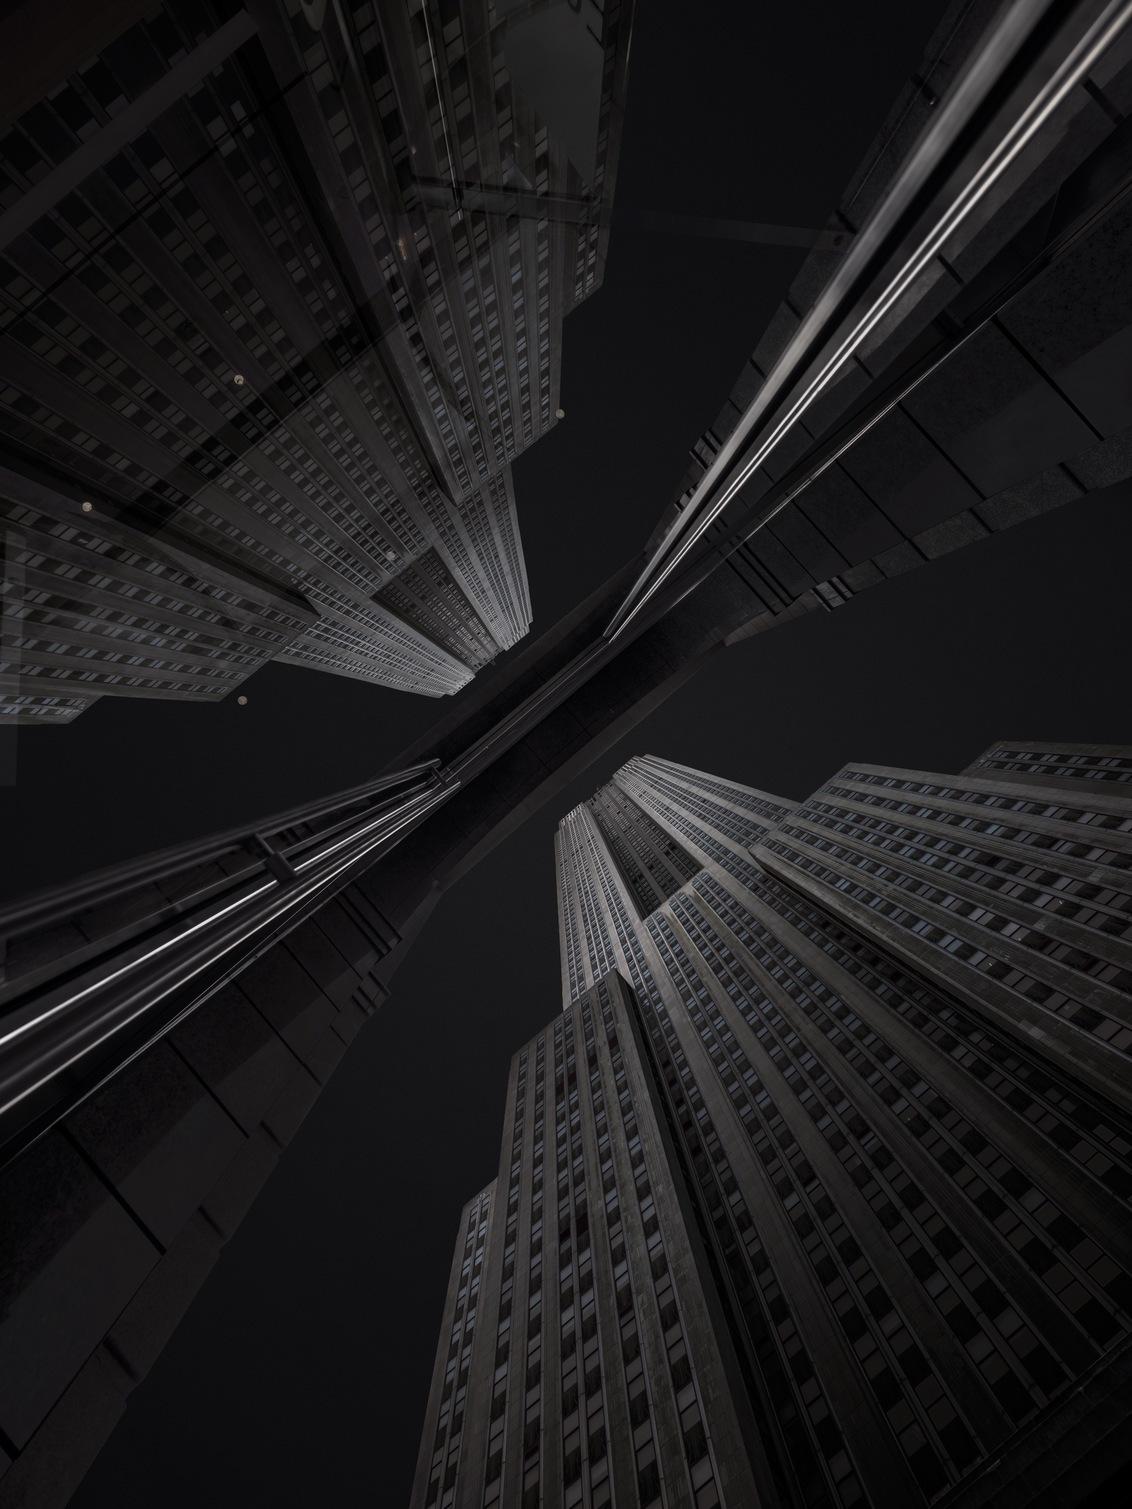 Empire State Building - Empire state building, New York  Facebook:  MathijsvandenBoschPhotography Instagram: MathijsvandenBosch_photography - foto door MathijsvandenBosch op 29-09-2016 - deze foto bevat: architectuur, gebouw, skyline, newyork, city, manhattan, building, architecture